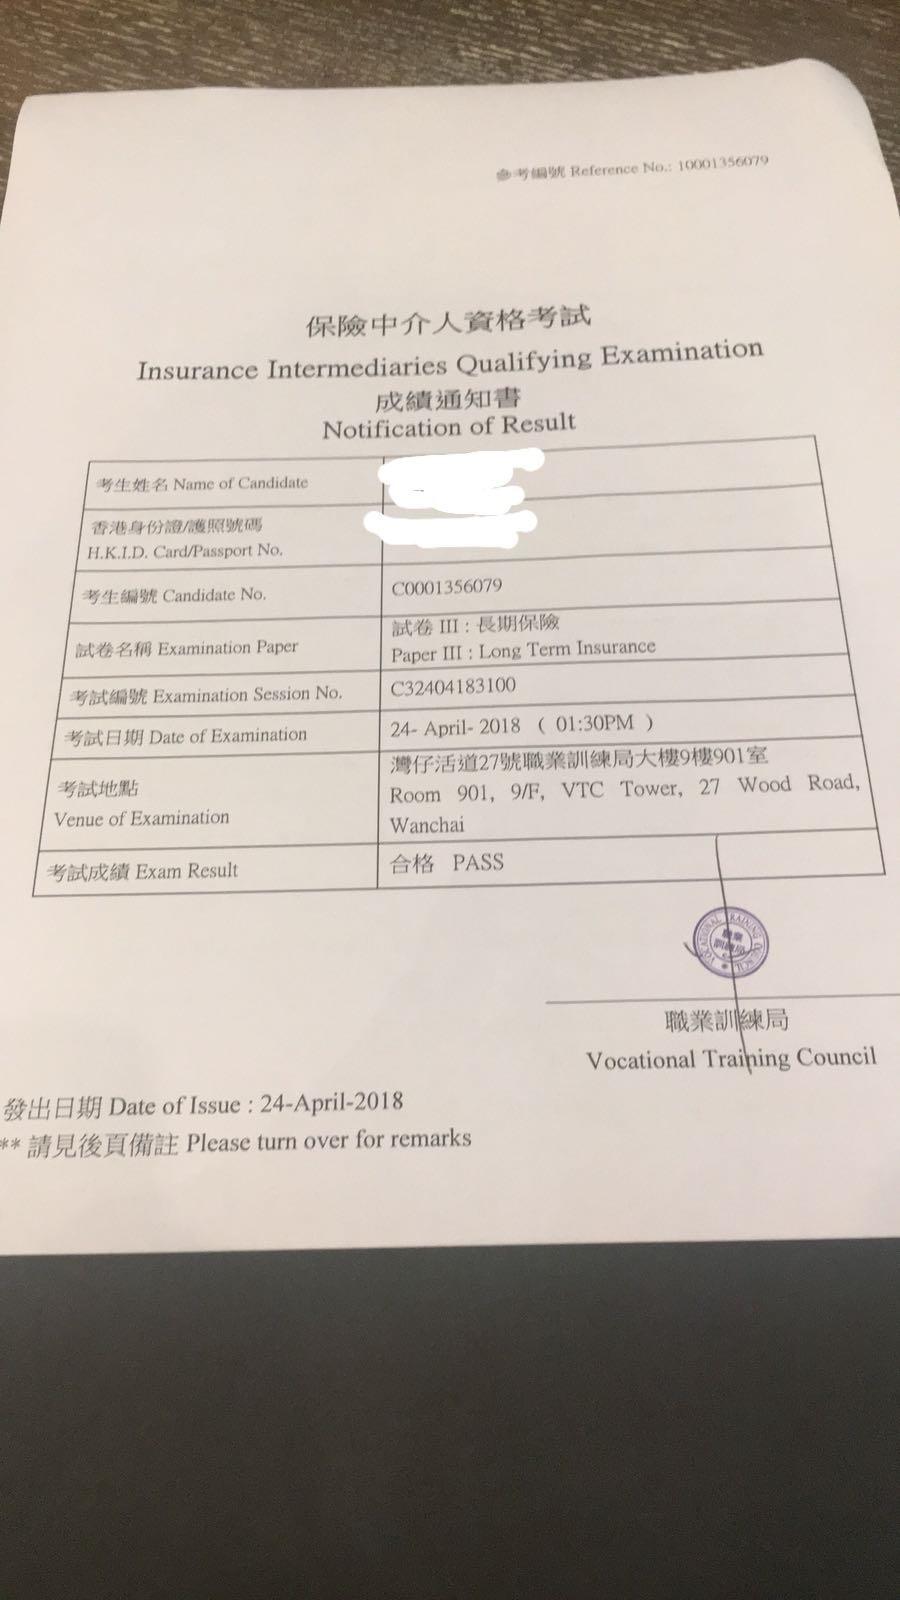 CKW 24/4/2018 IIQE Paper 3 保險中介人資格考試卷三 Pass